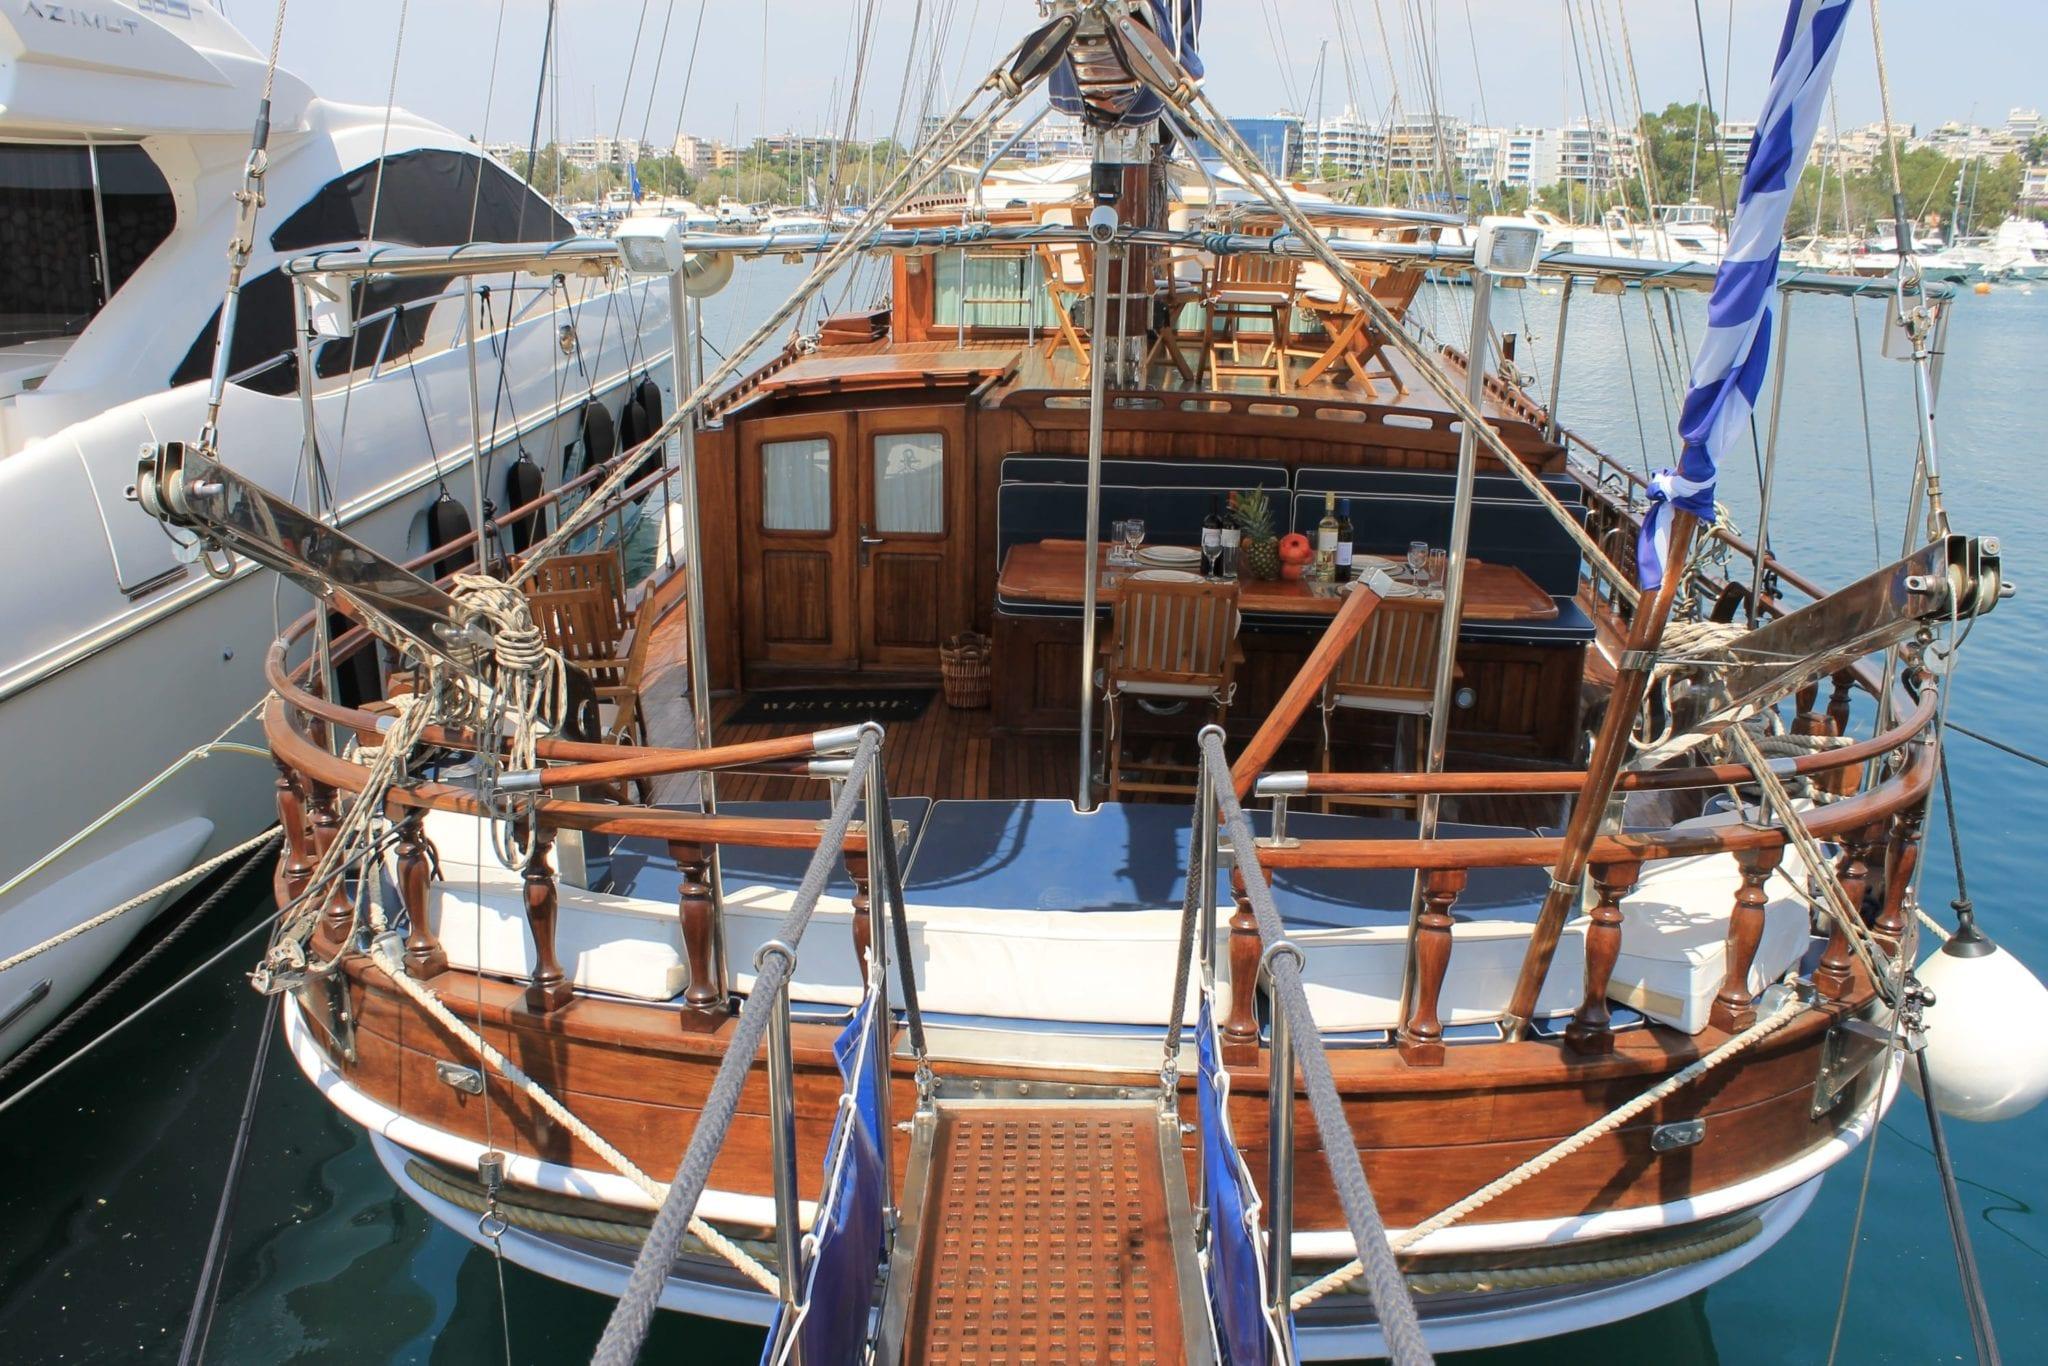 apollon motor sailer aft min -  Valef Yachts Chartering - 4746